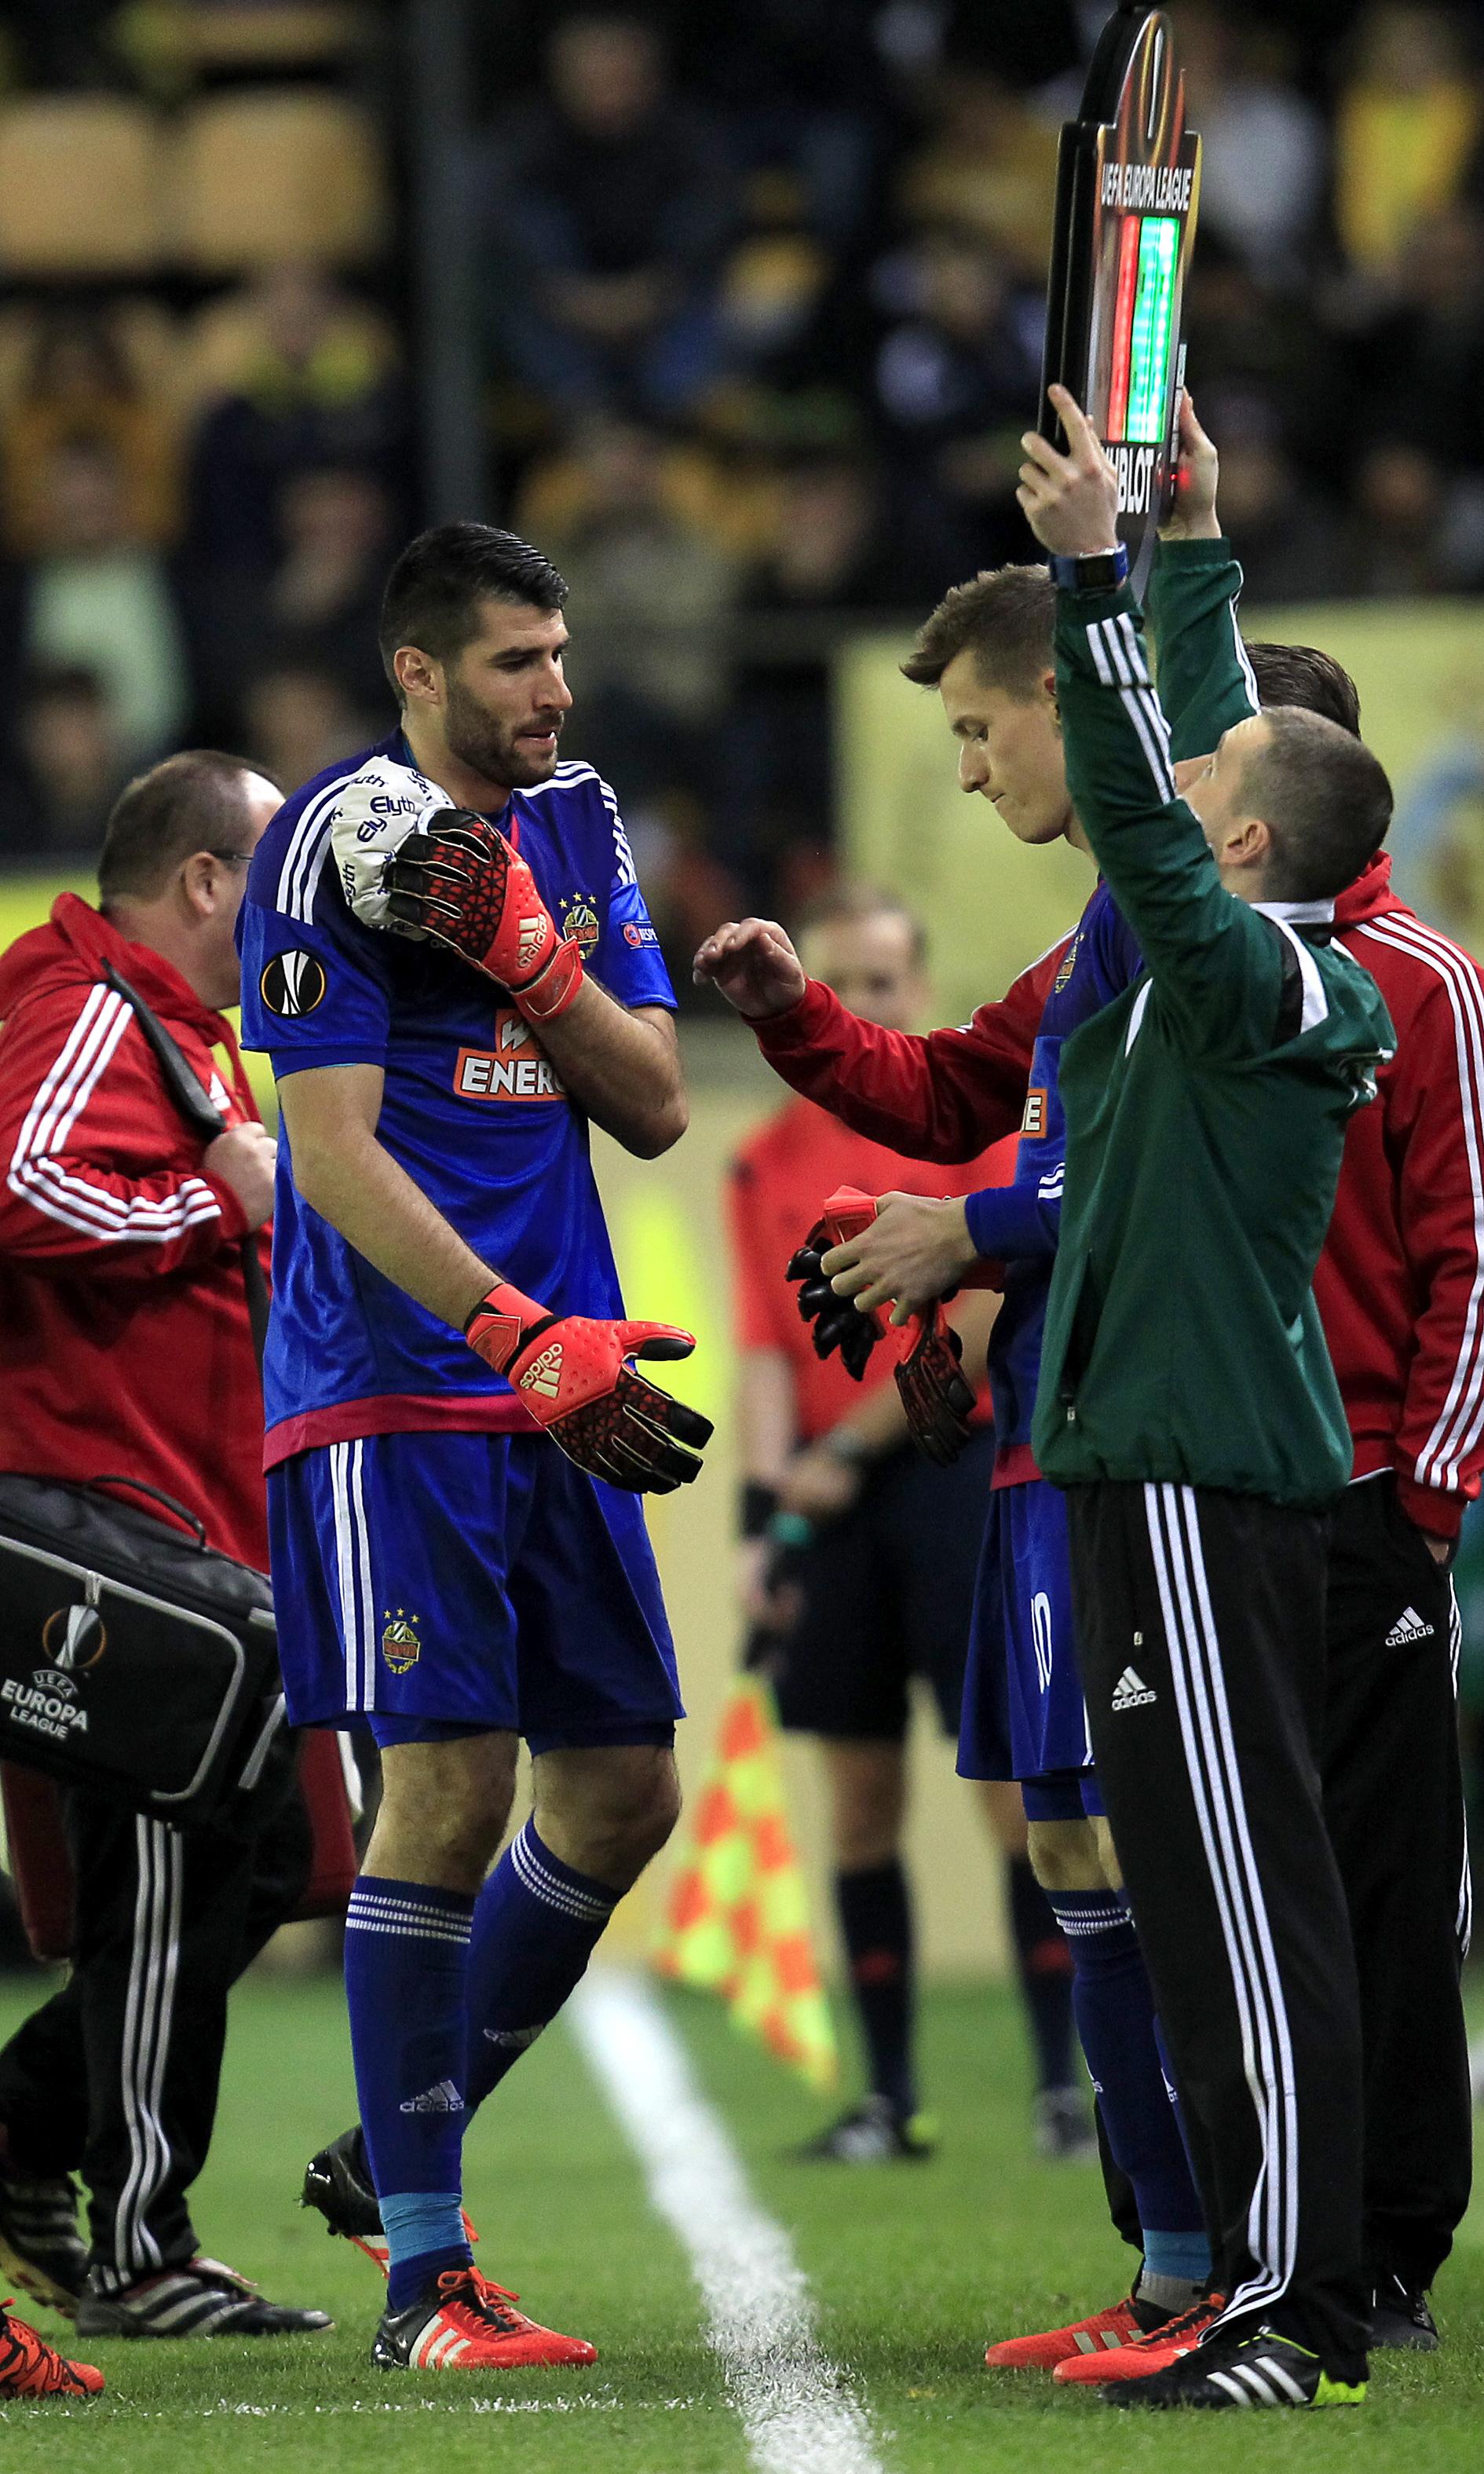 spain_soccer_europa_league088092304782_r2354.jpg